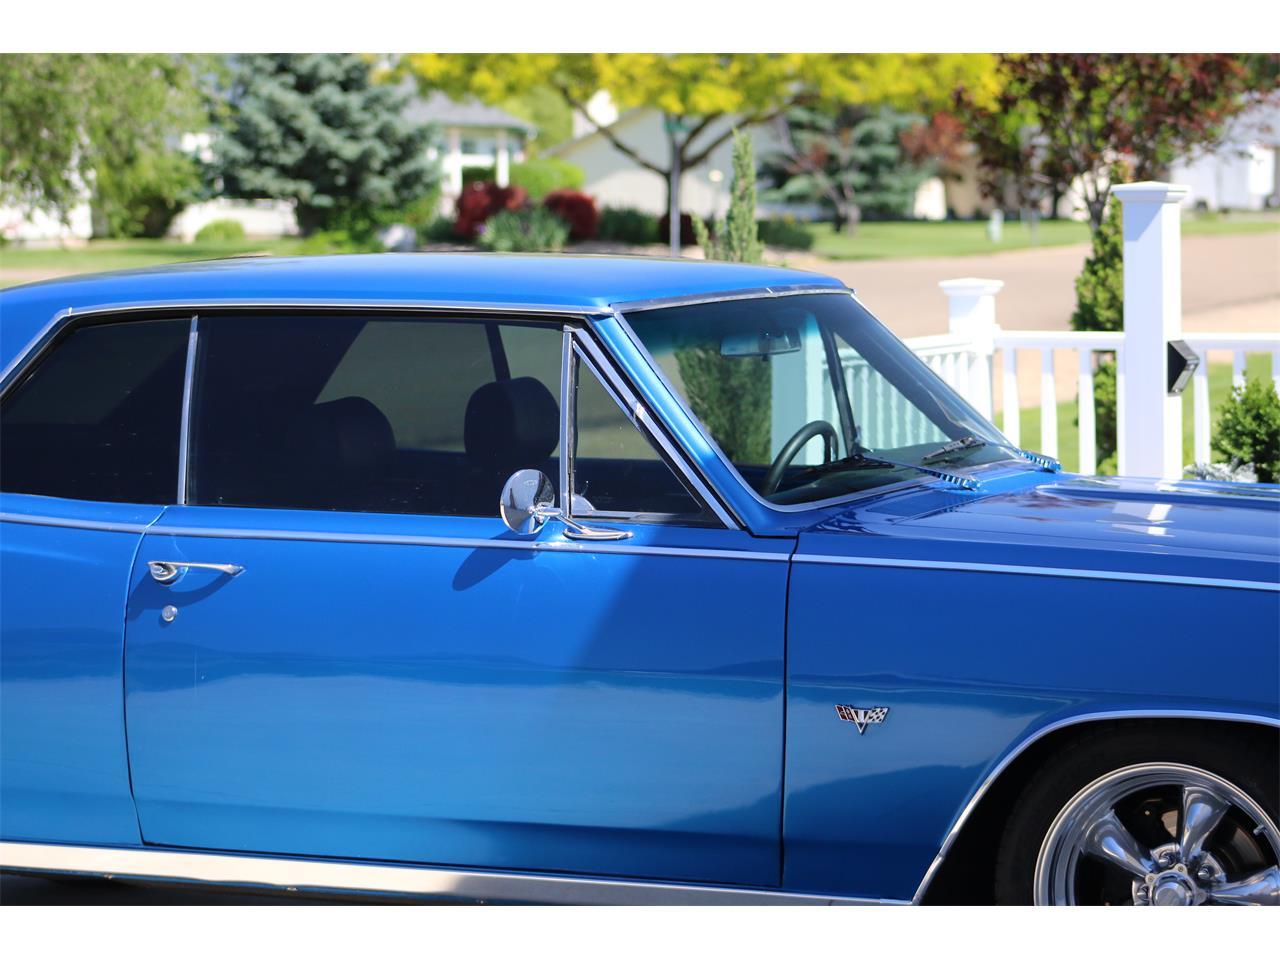 1964 Chevrolet Chevelle Malibu SS (CC-1221595) for sale in Nampa, Idaho